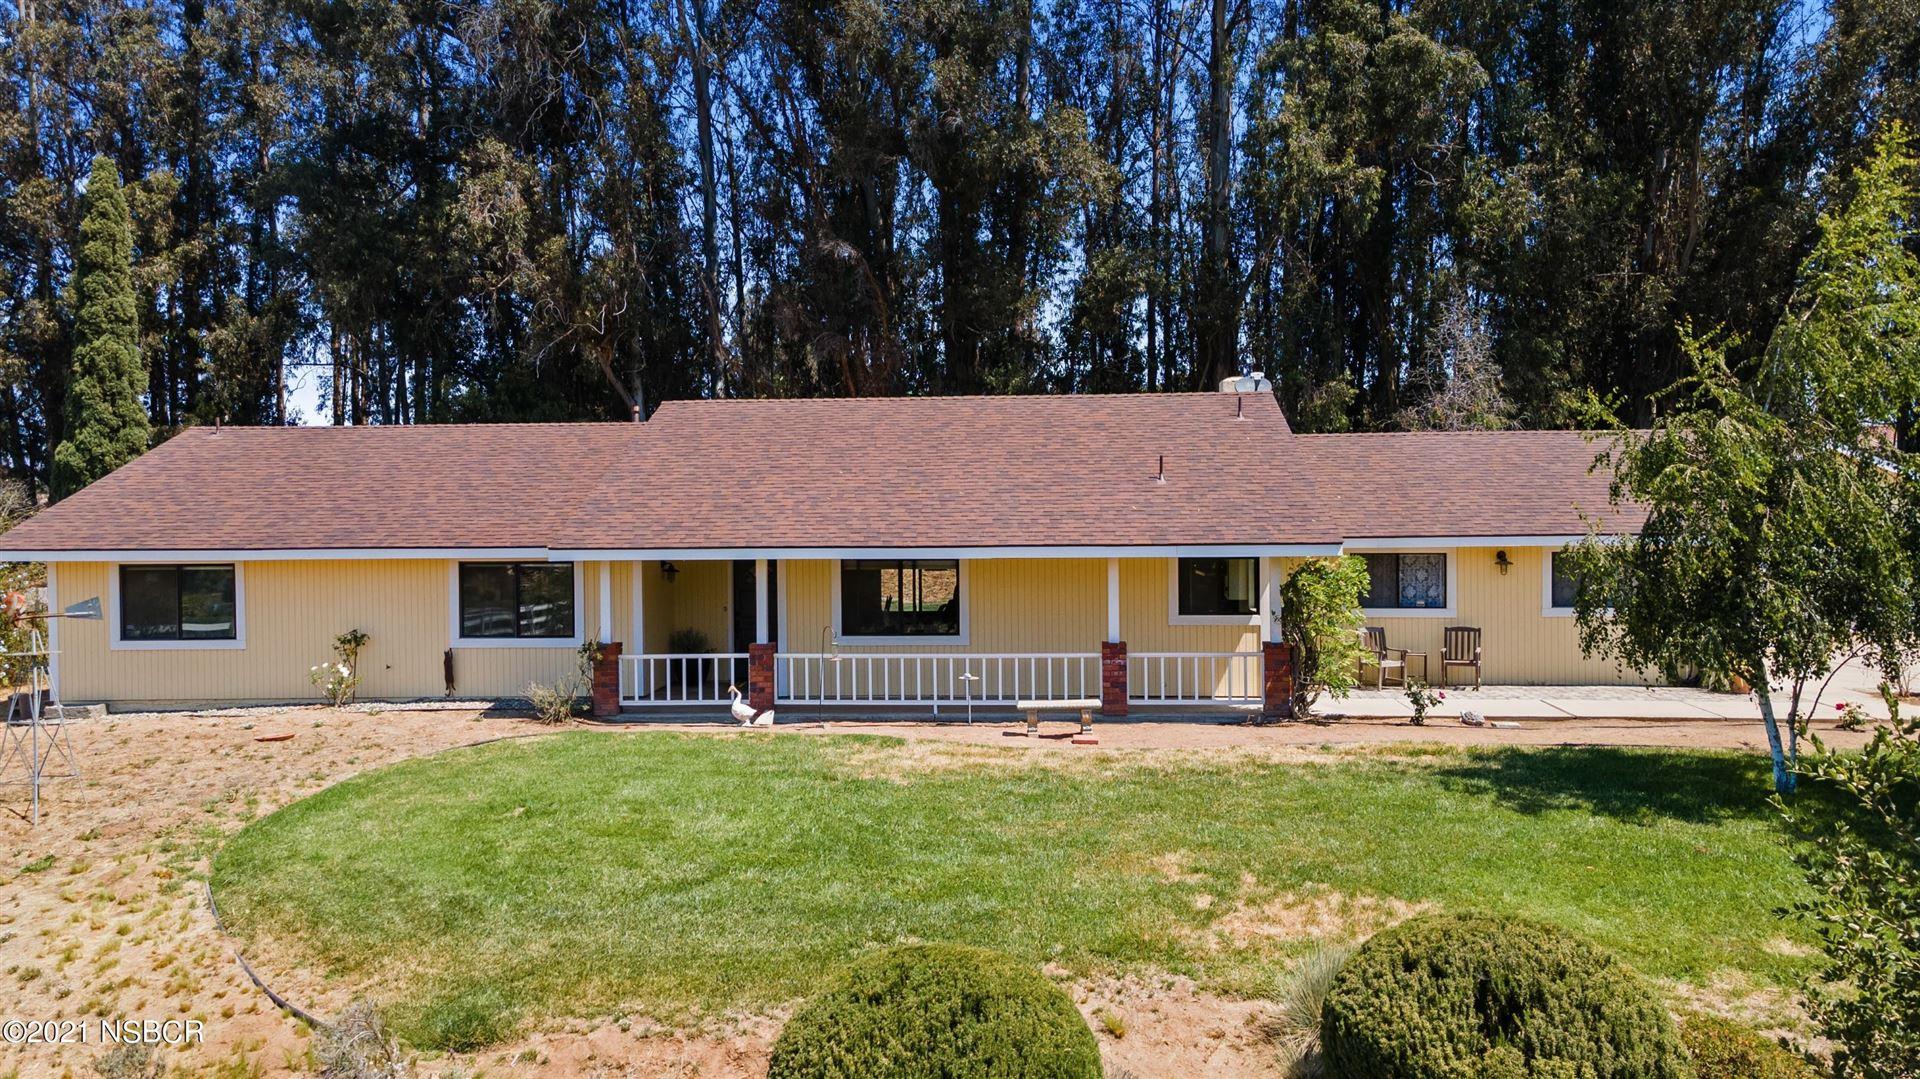 882 Peggy Lee Court, Nipomo, CA 93444 - MLS#: 21001566